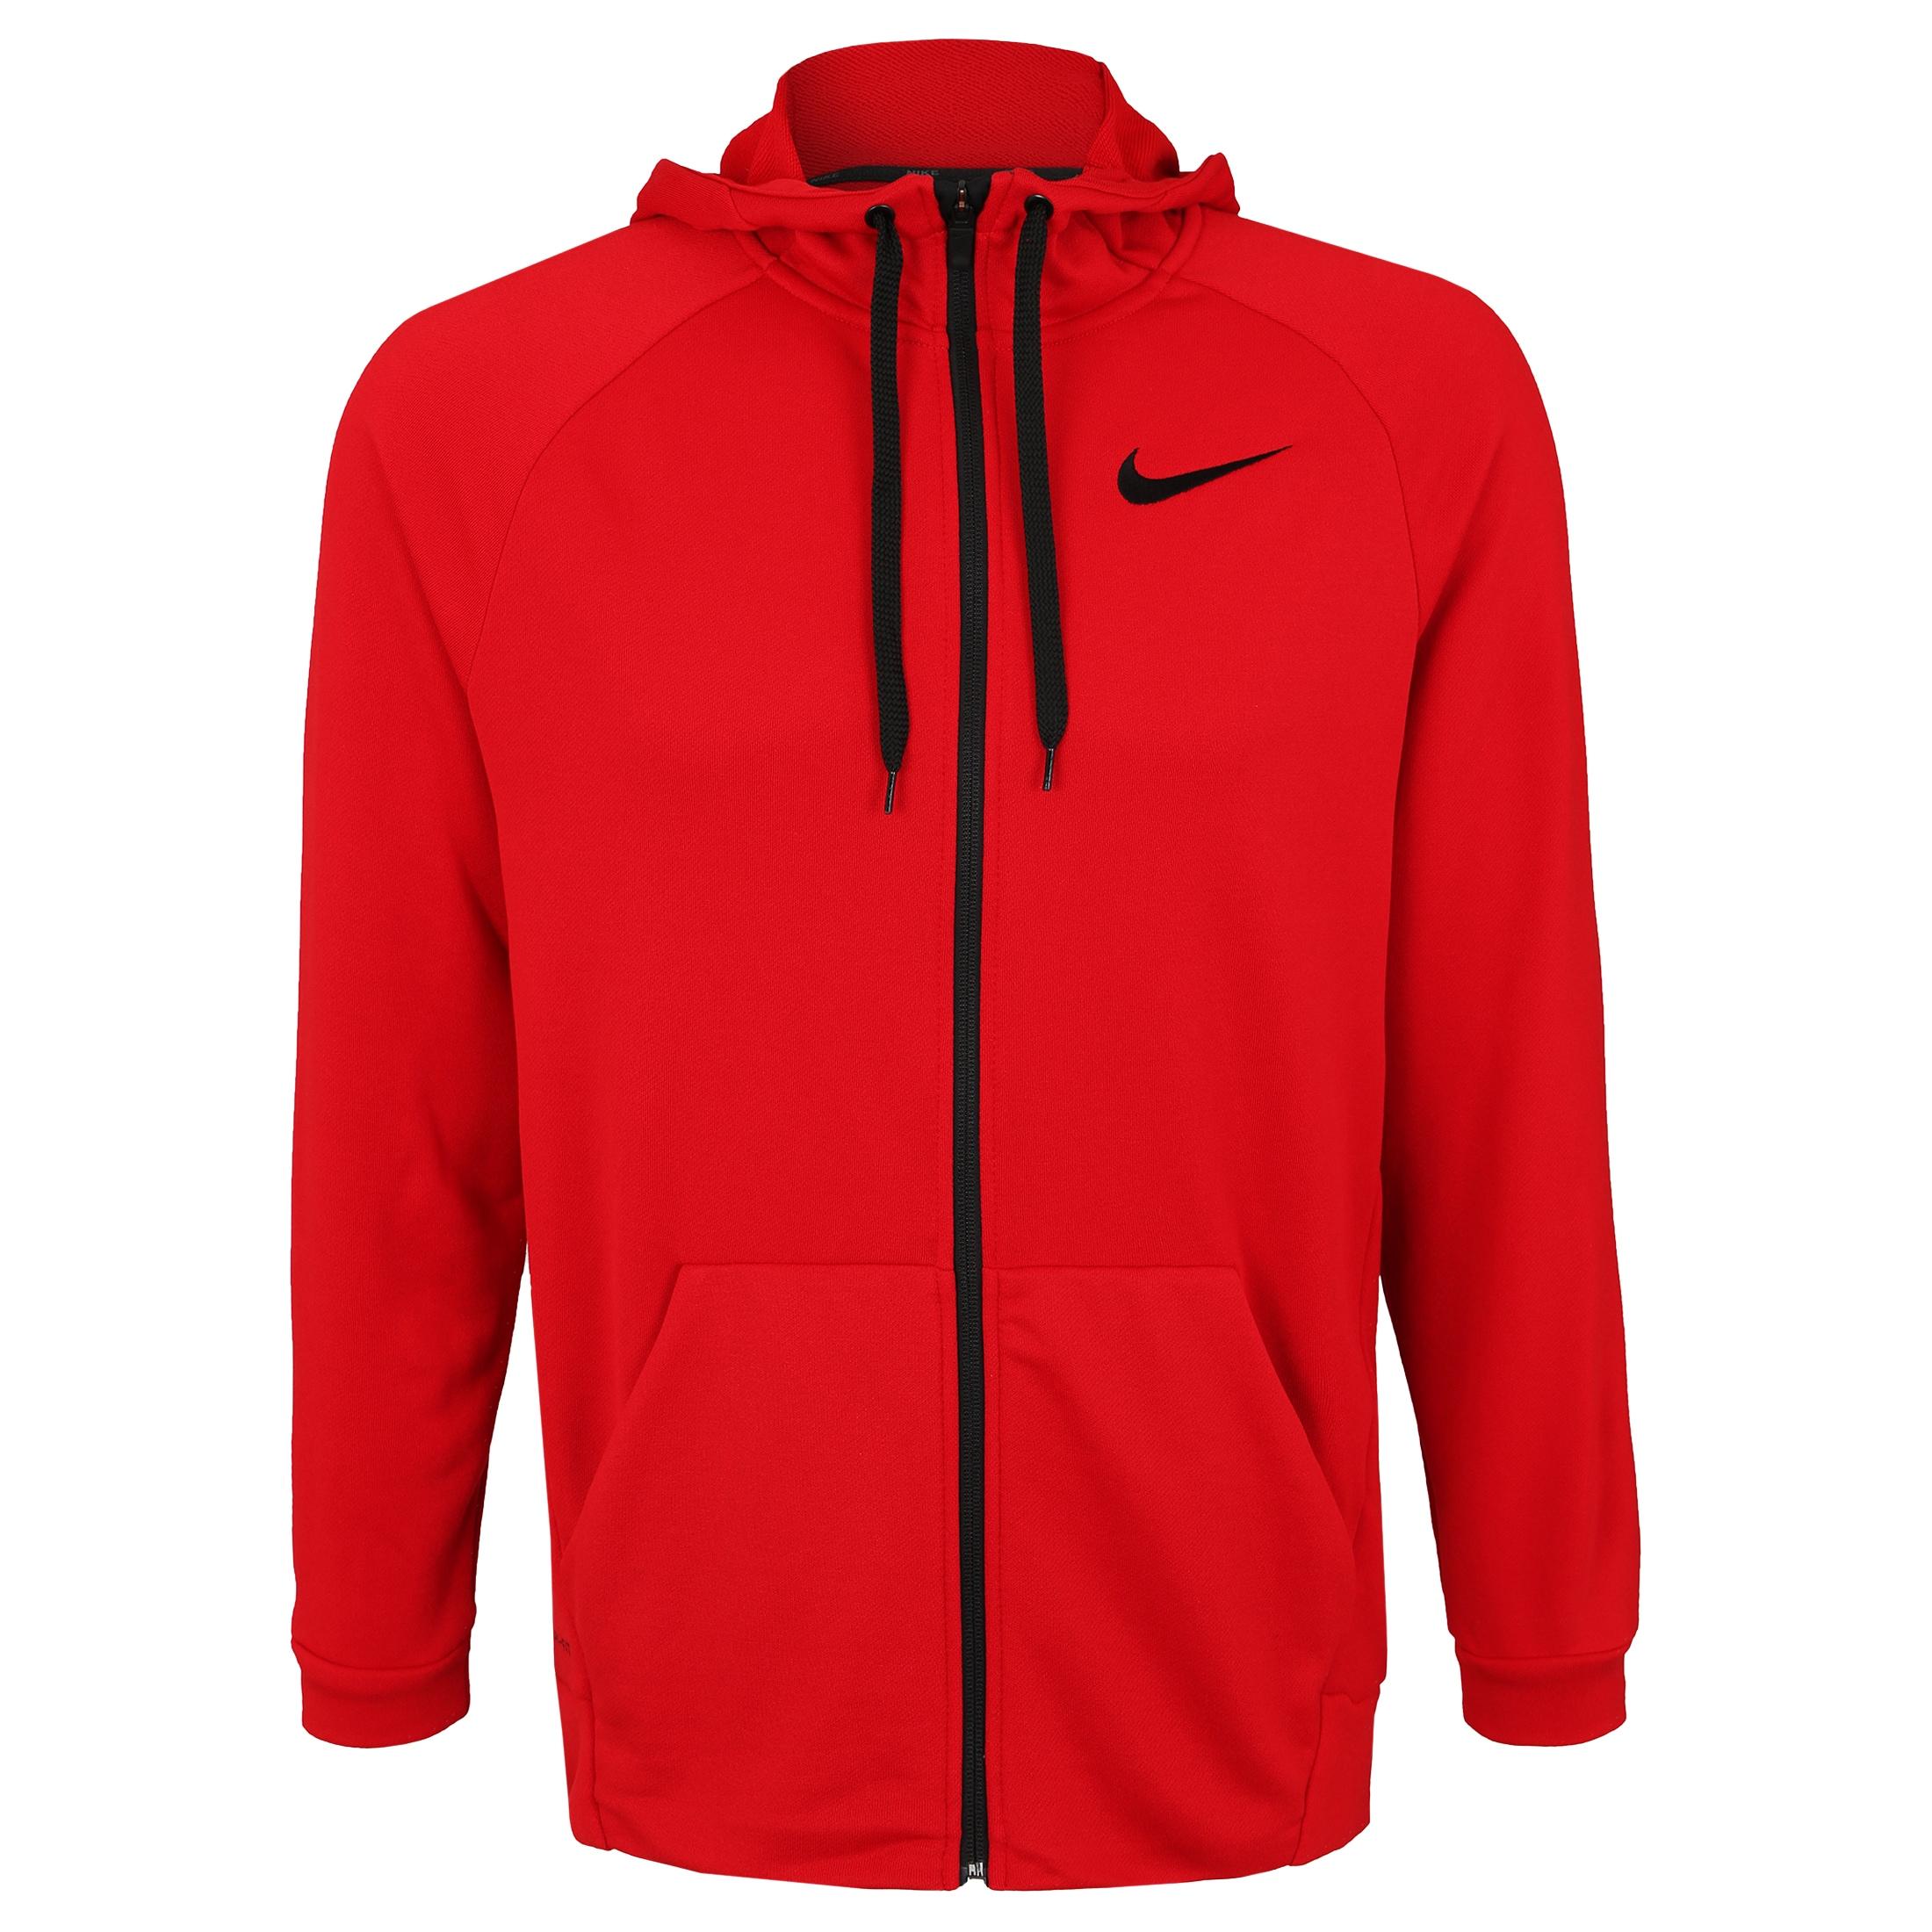 Nike Trainingsjacke Dry rot Herren Übergangsjacken Jacken Mäntel